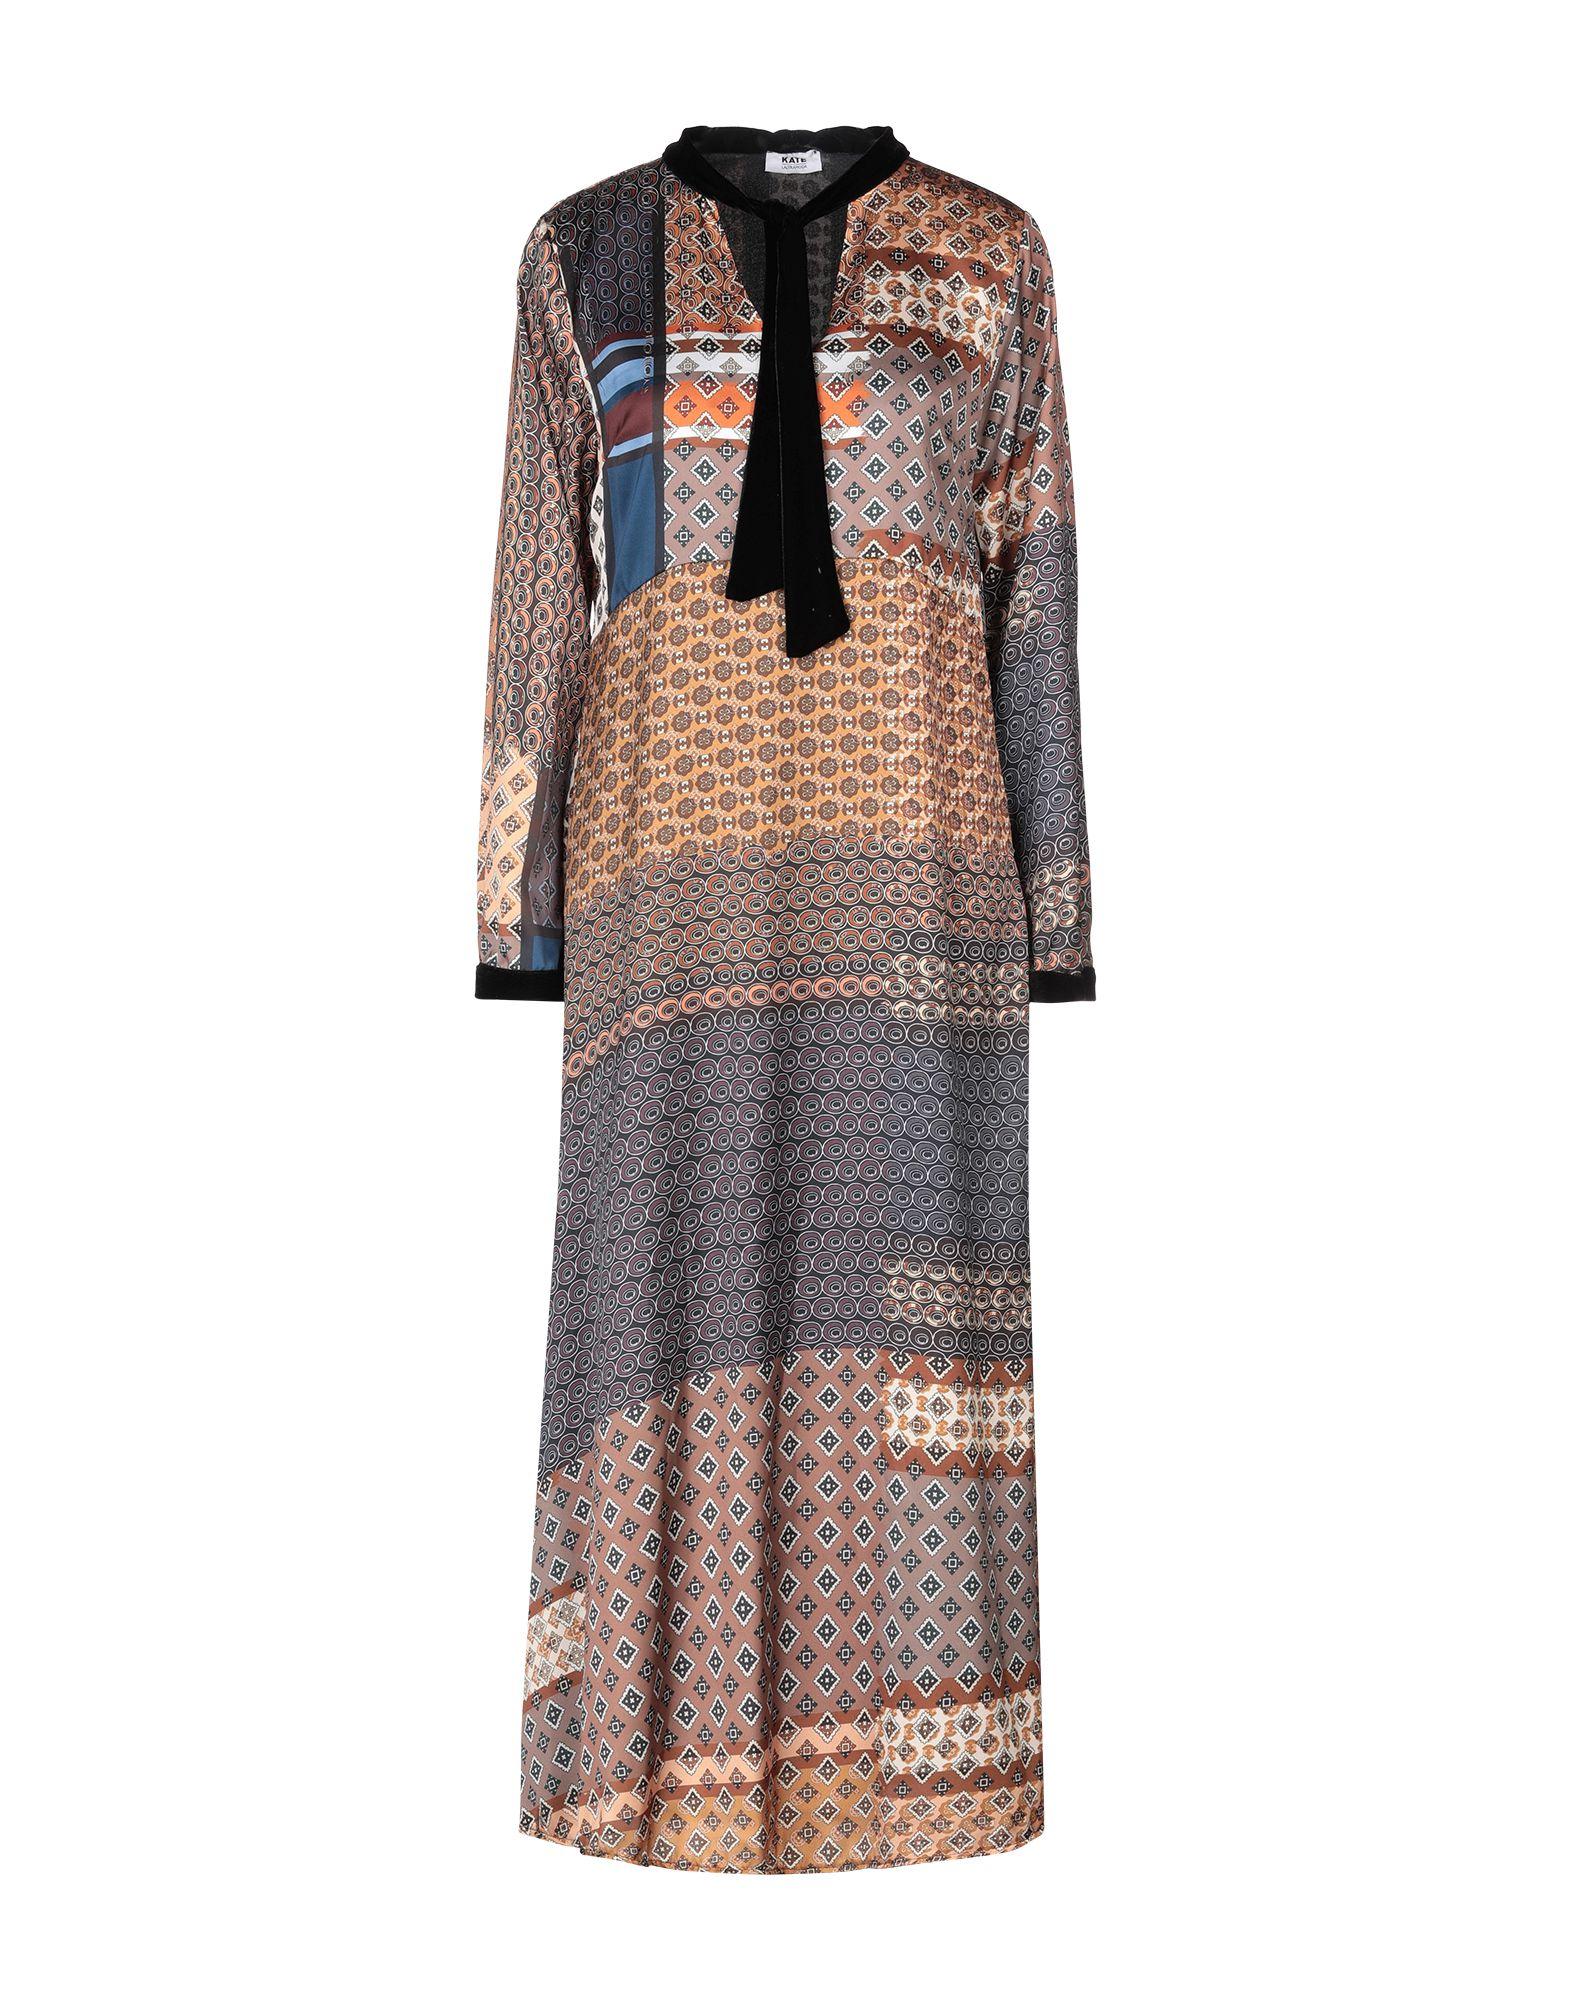 KATE BY LALTRAMODA Платье длиной 3/4